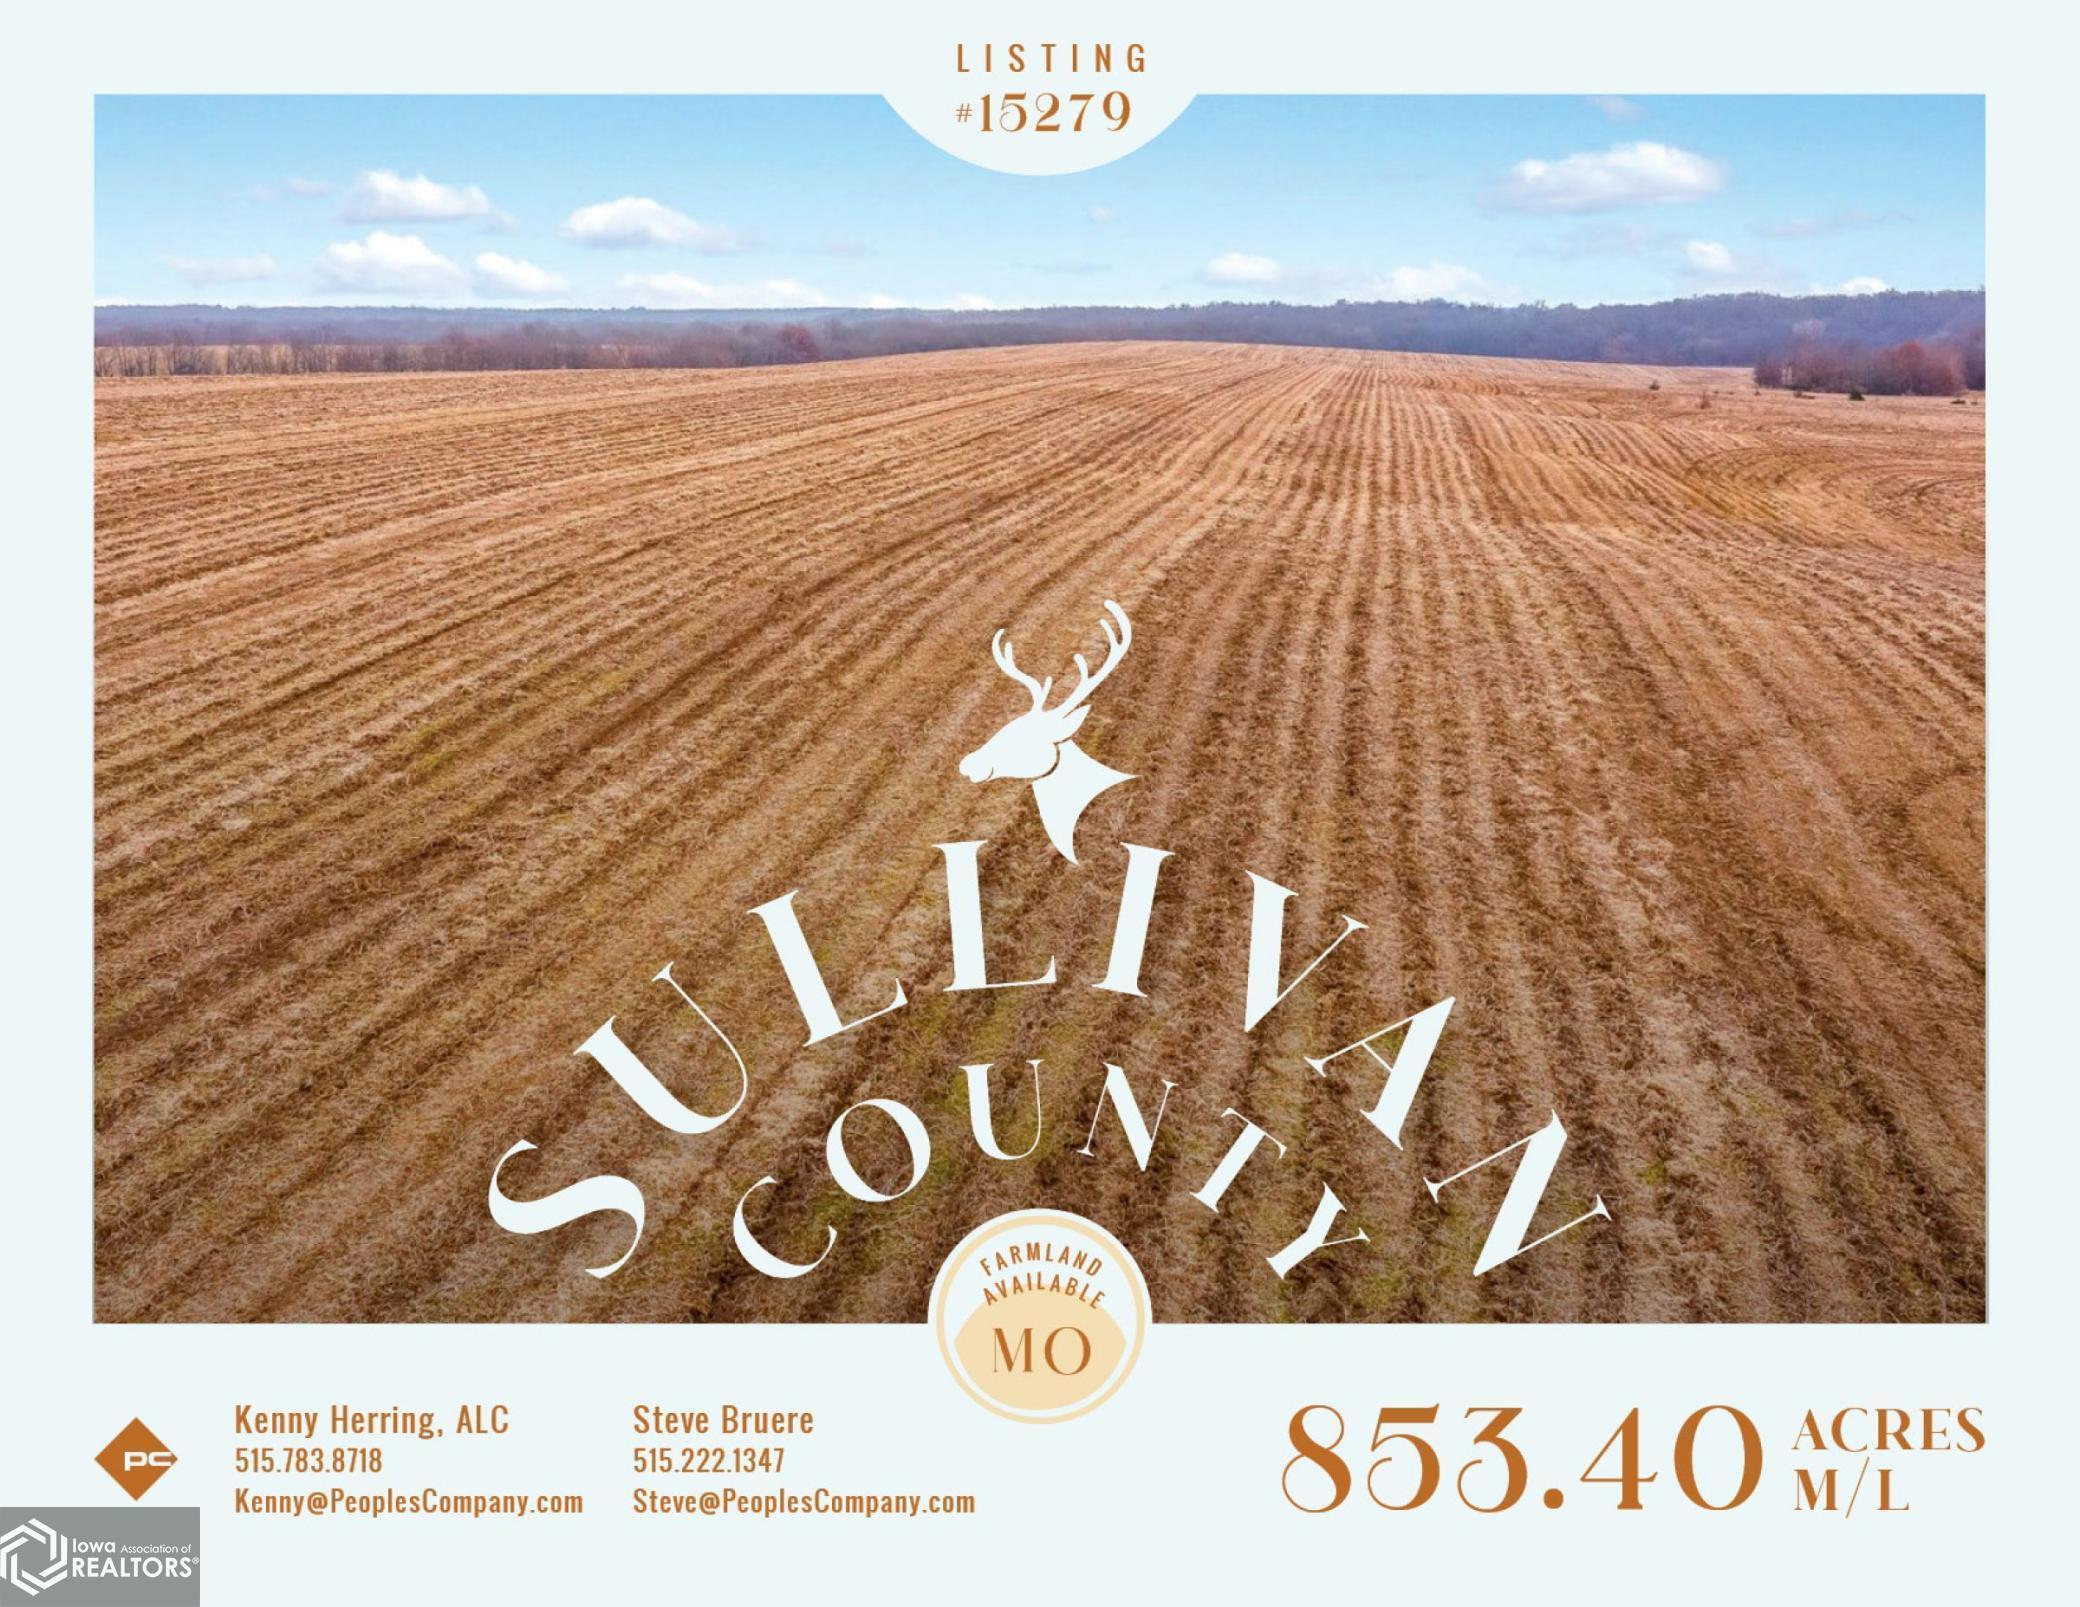 land-sullivan-county-missouri-853-acres-listing-number-15279--2020-12-18-162149